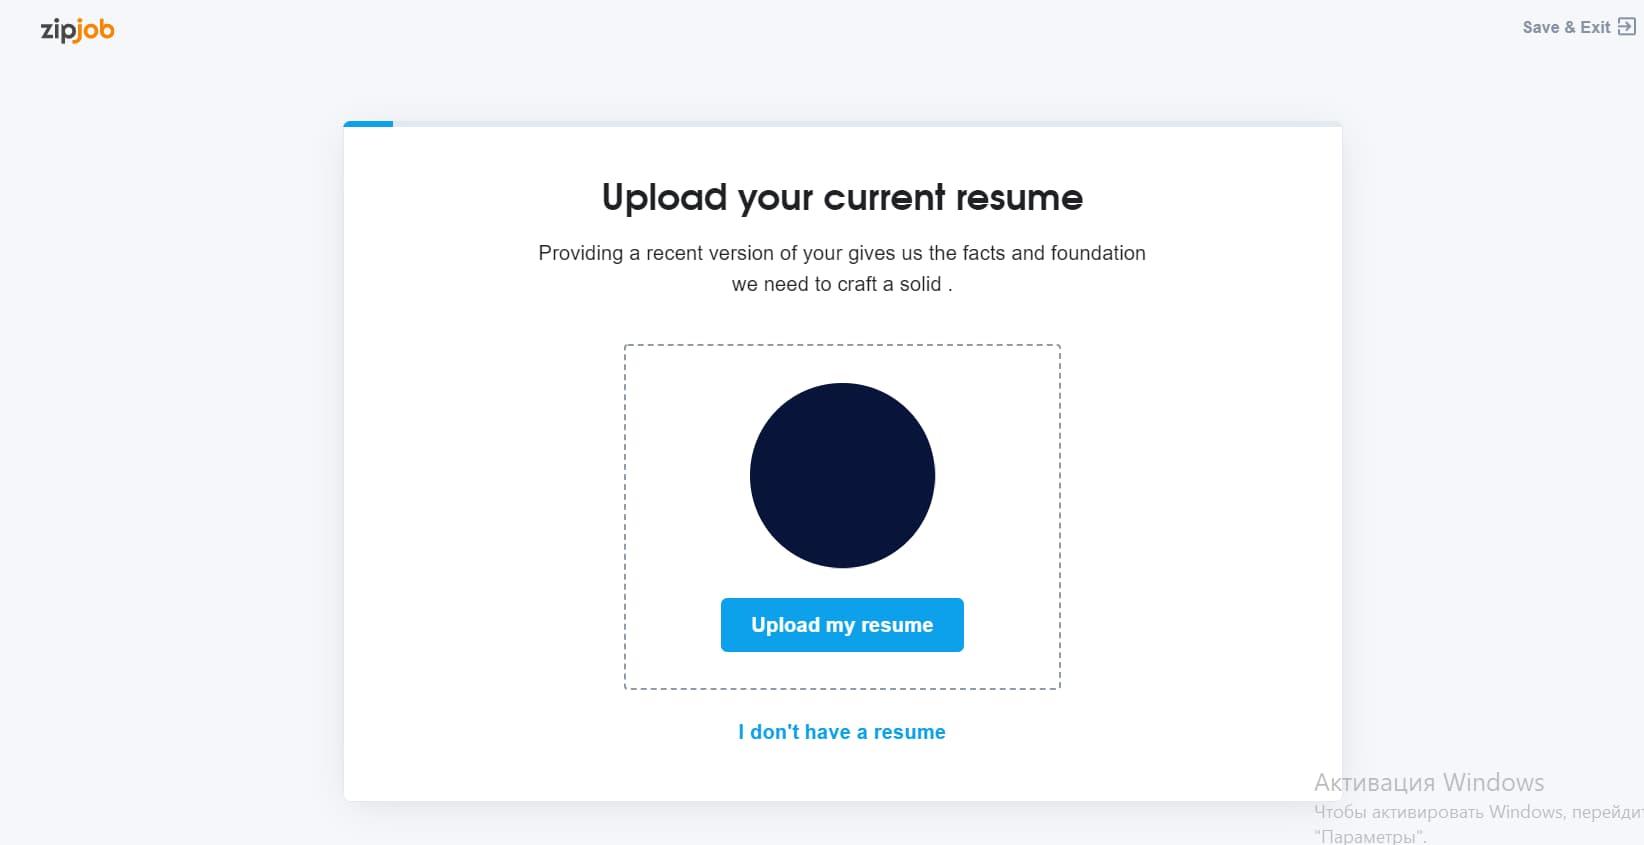 zipjob upload resume